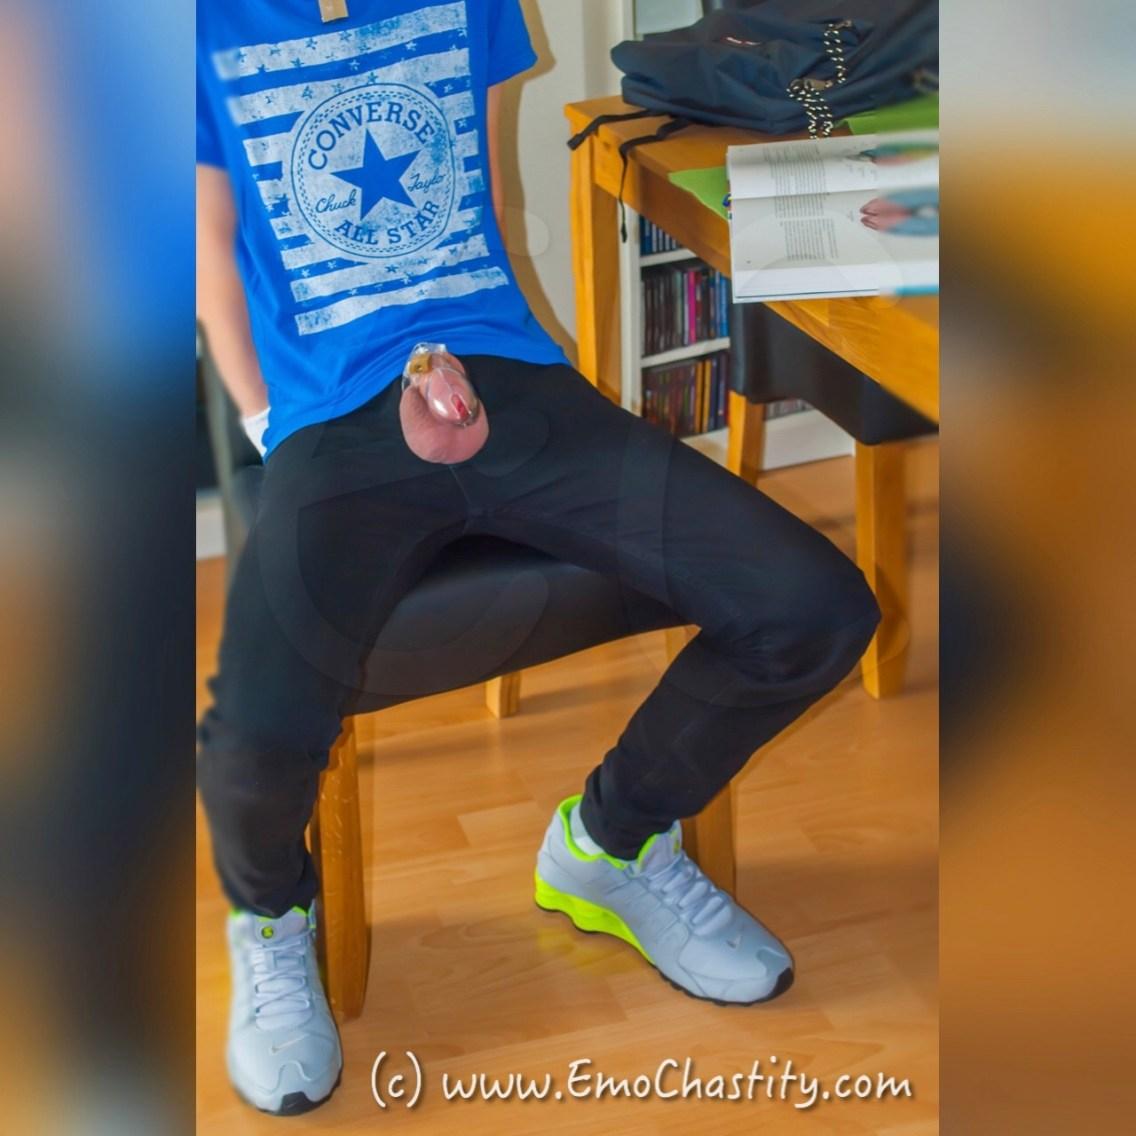 tumblr_nsz8h60GBK1u0r98co3_1280